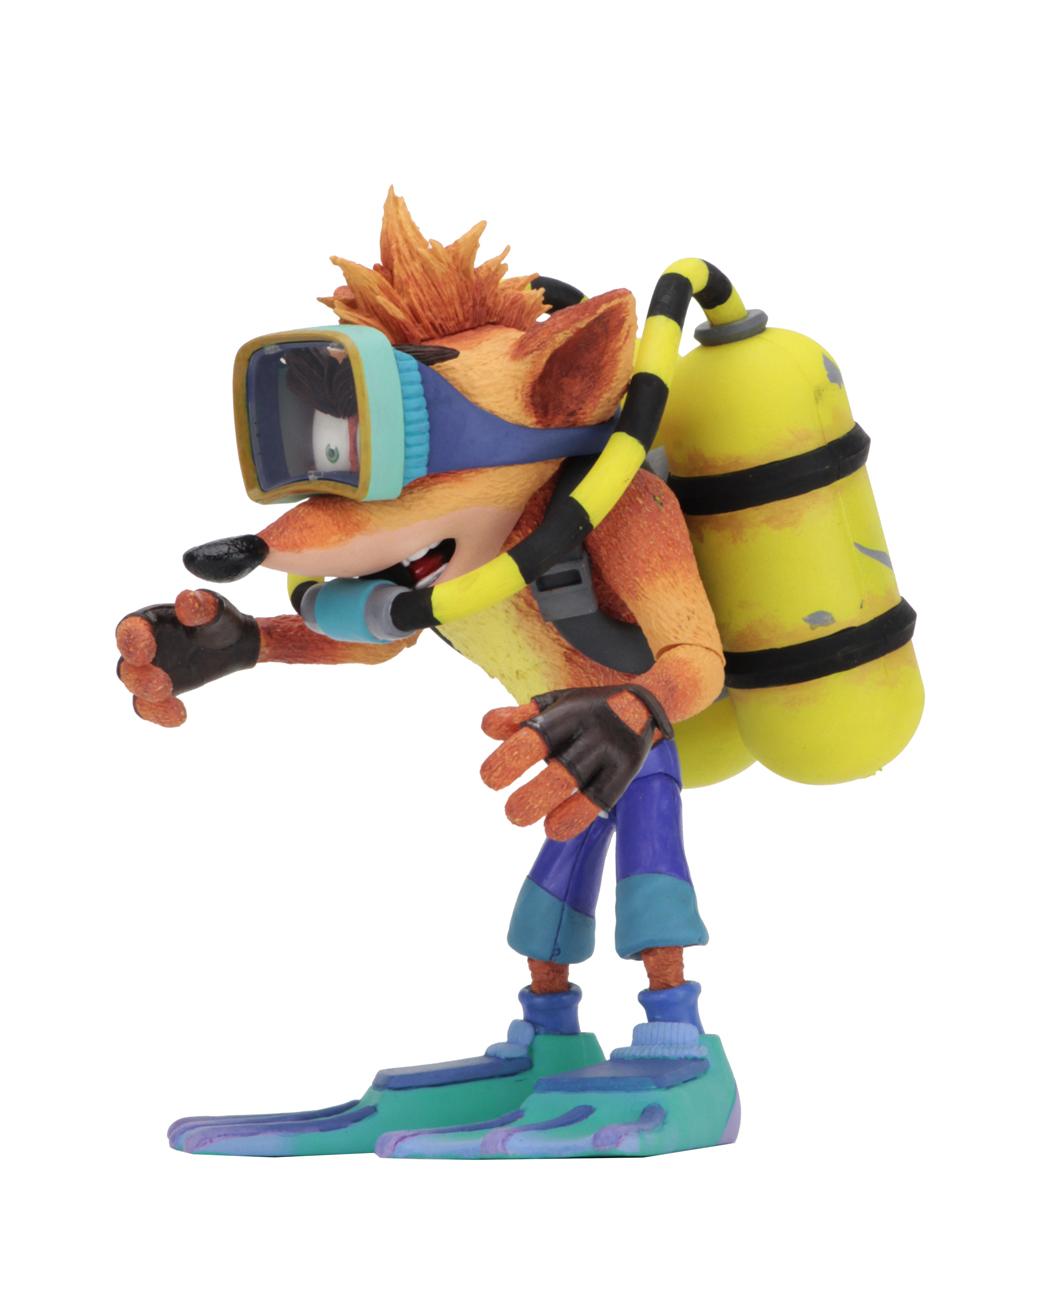 Crash Bandicoot Crash avec Scuba gear NECA Deluxe Action Figure